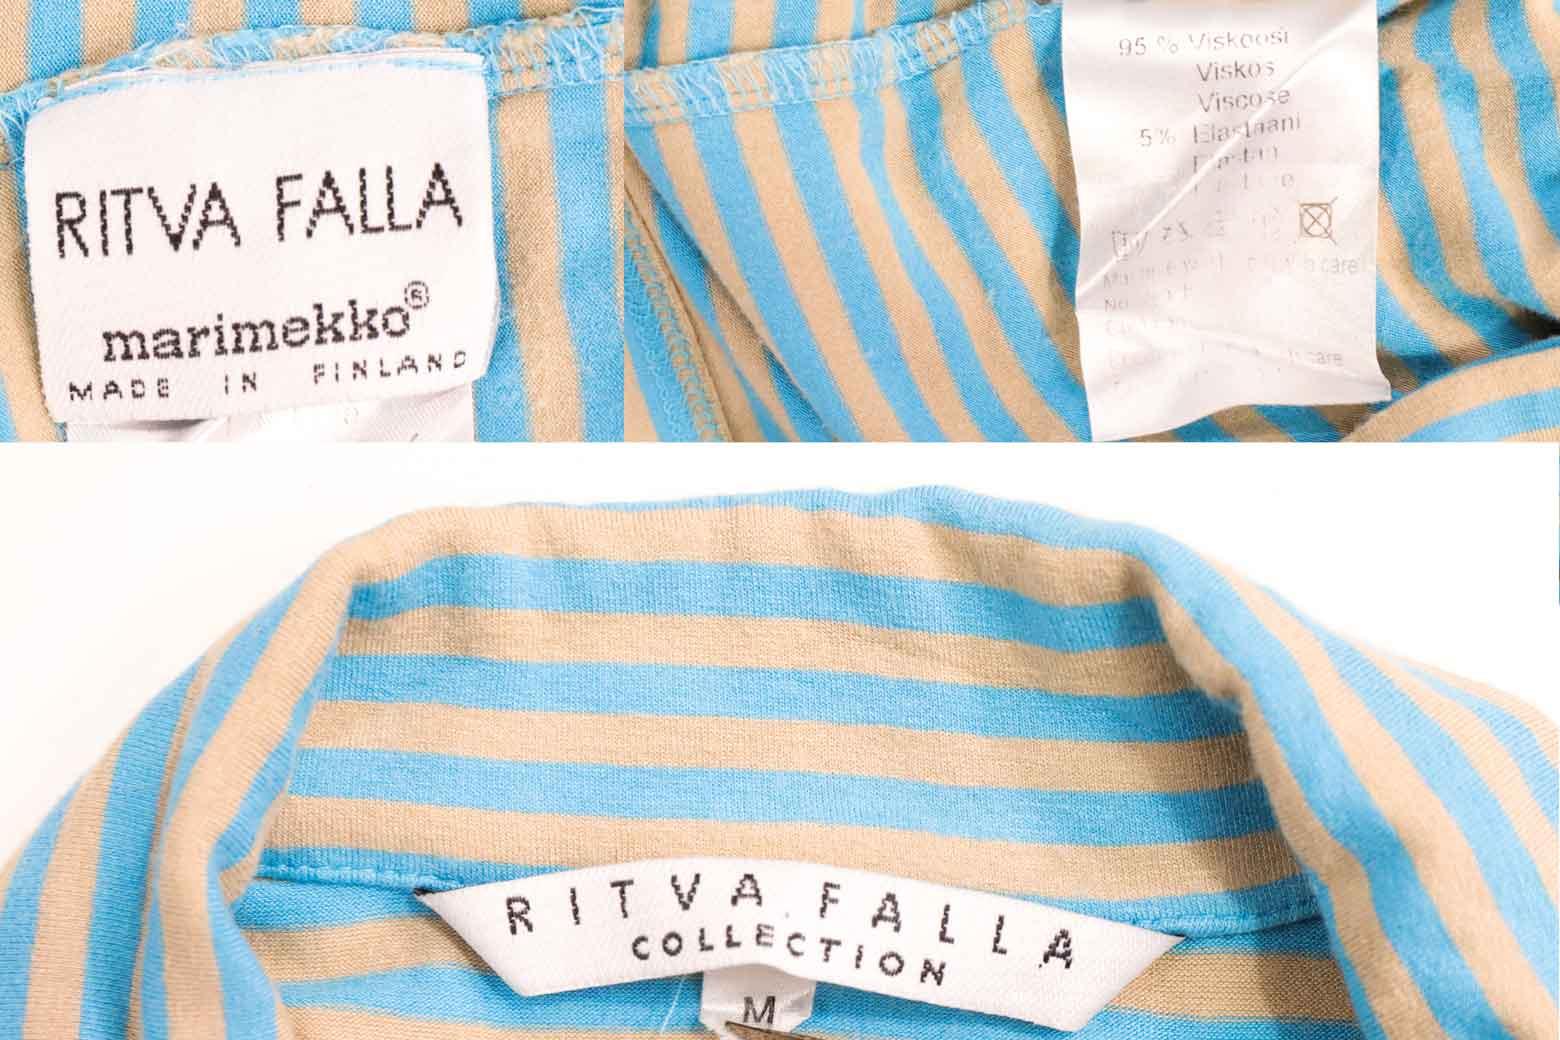 marimekko Ritva Falla Jacket Cardigan/マリメッコ リトヴァファッラ ジャケット カーディガン